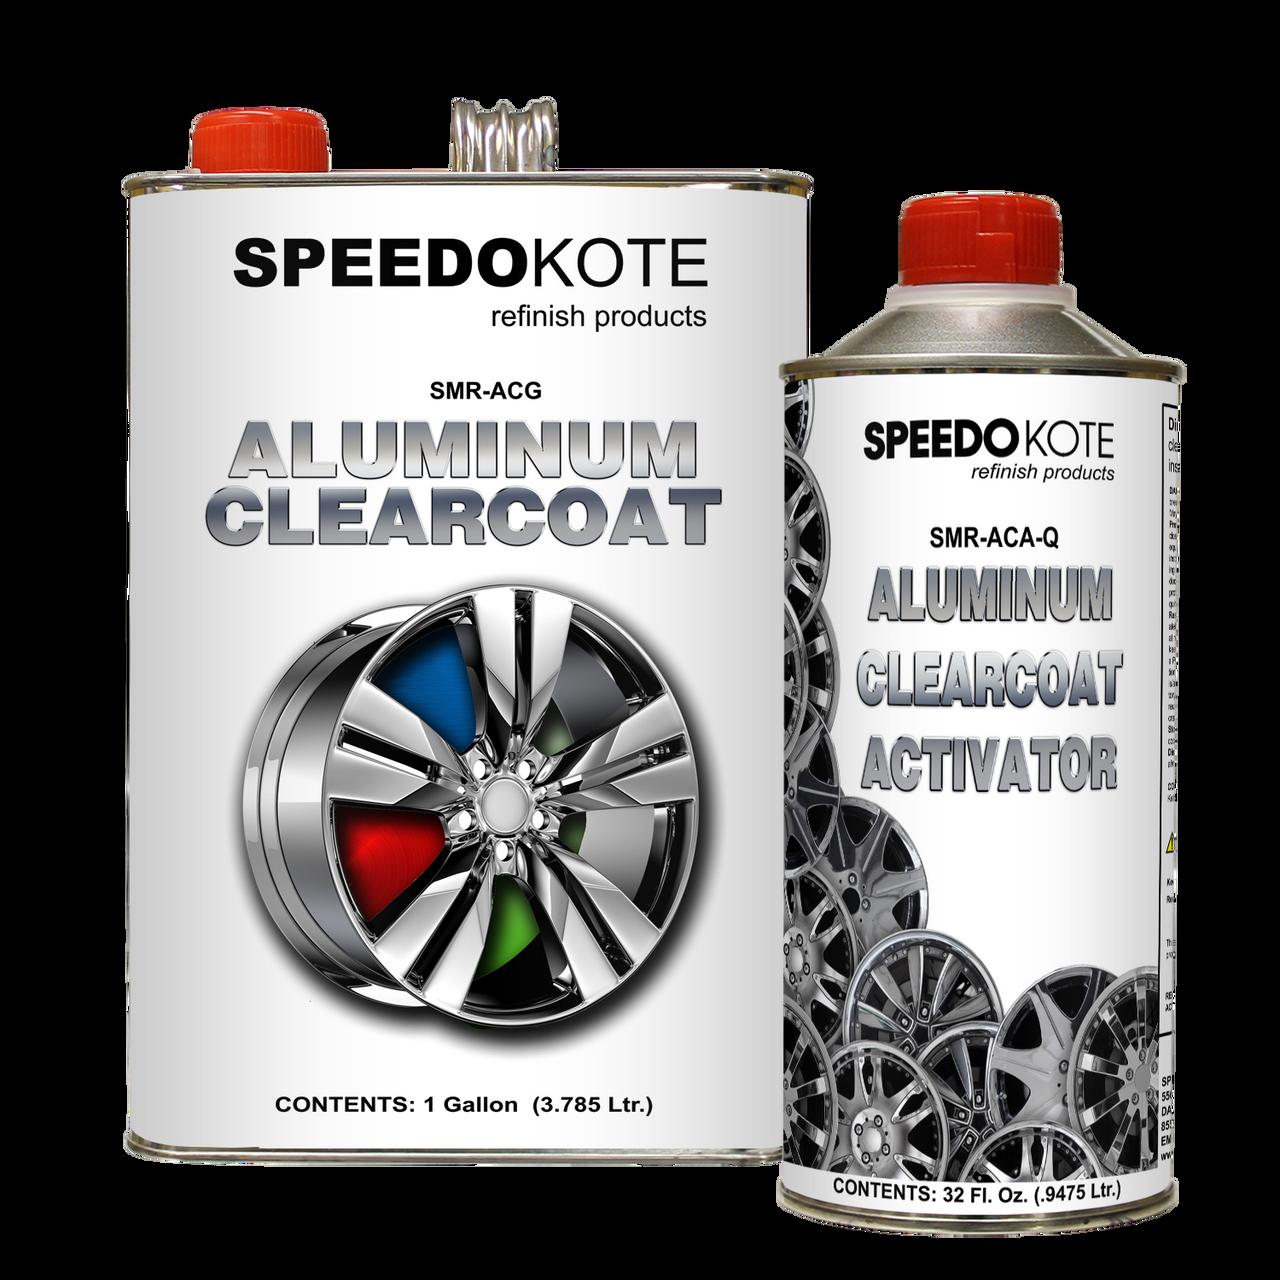 Direct to Aluminum Clear Coat 2K Urethane, SMR-ACG/ACA 4:1 Clearcoat Gallon Kit